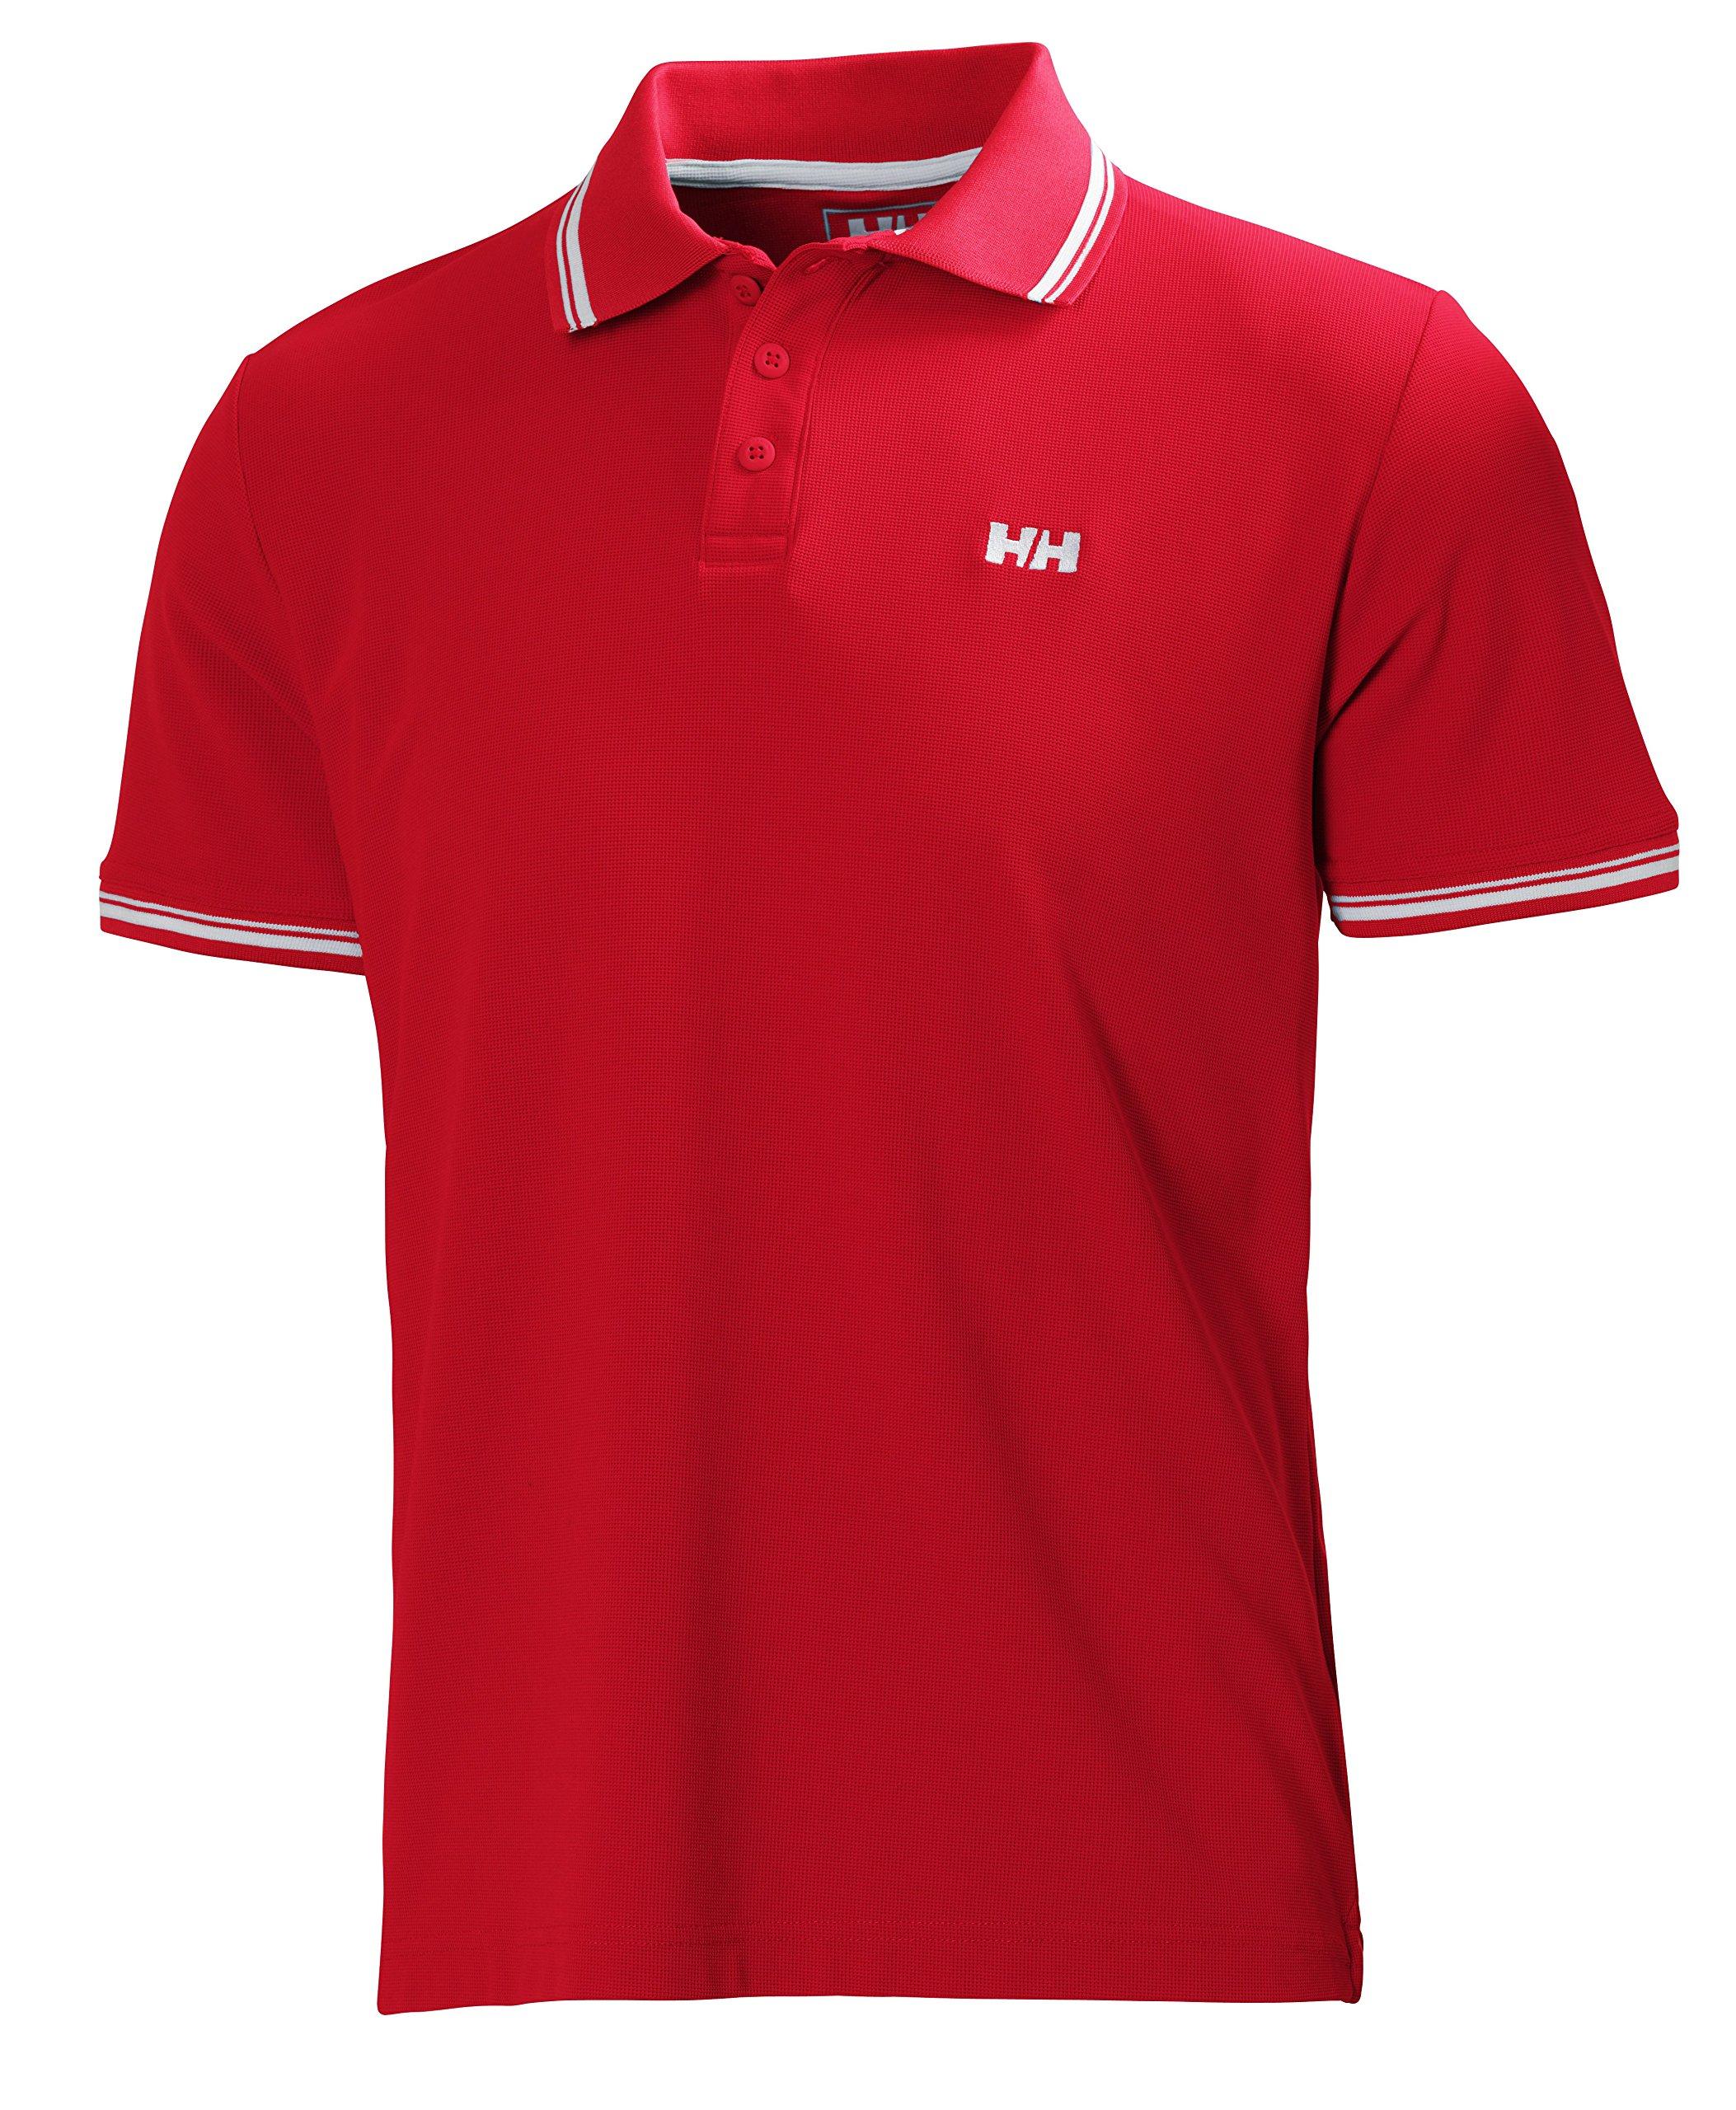 Helly Hansen Herren Polo Kos Short Sleeve, Redcurrant, XL, 50565